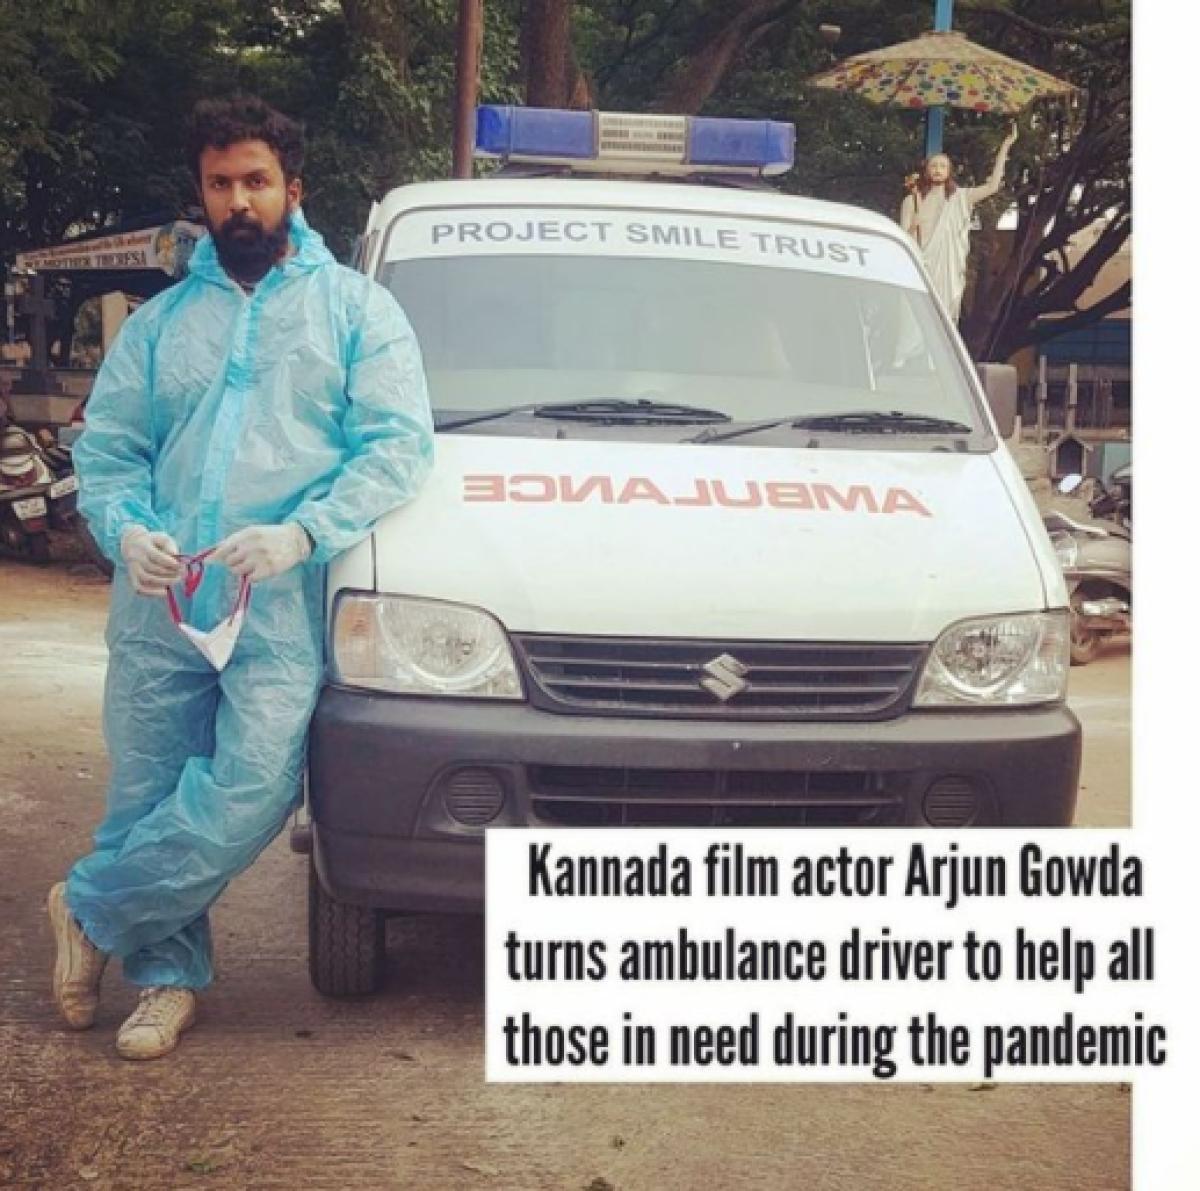 Kannada actor Arjun Gowda turns ambulance driver to help people amid COVID-19 crisis